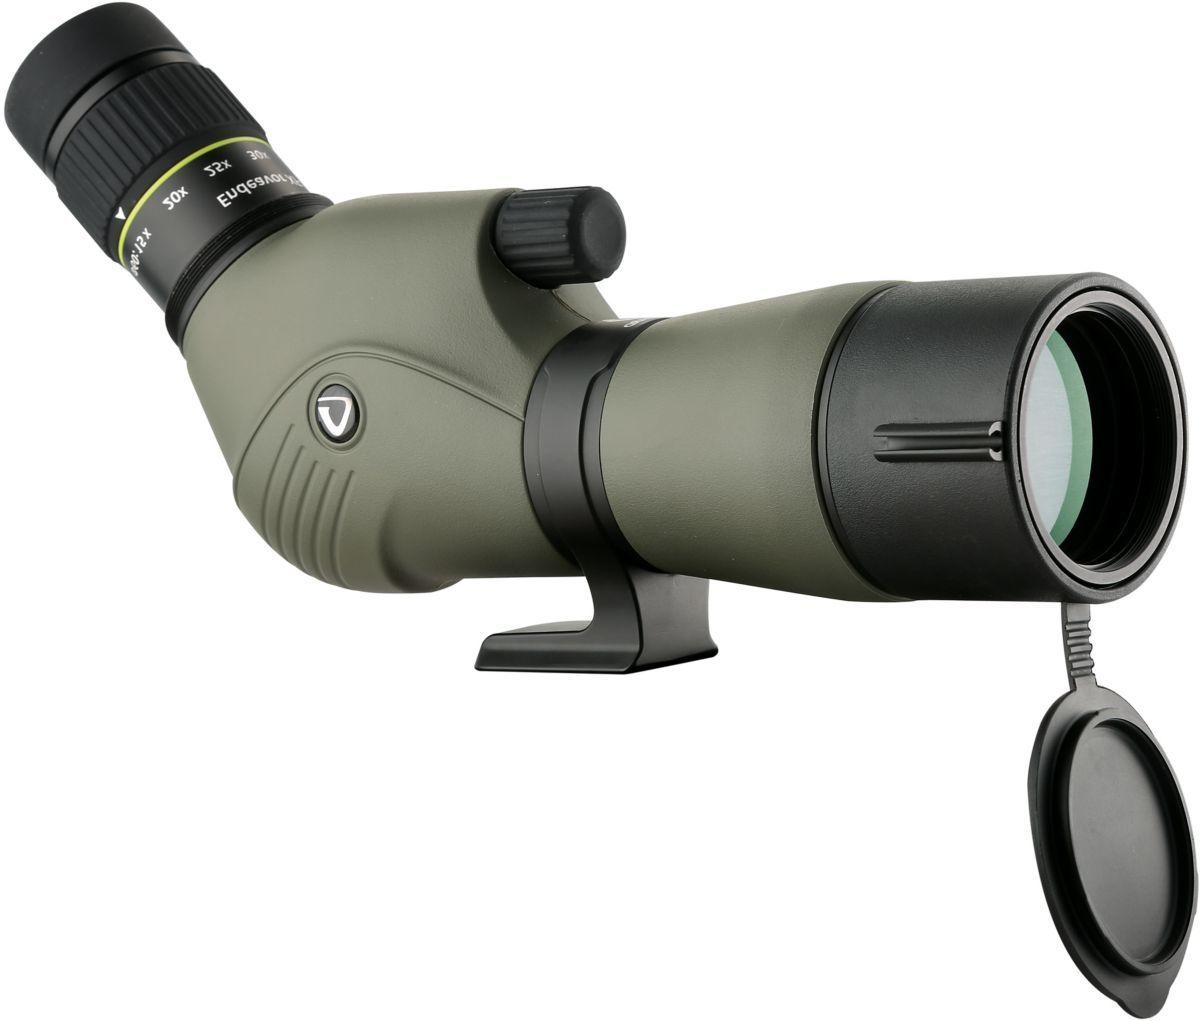 Vanguard Endeavor XF Spotting Scope